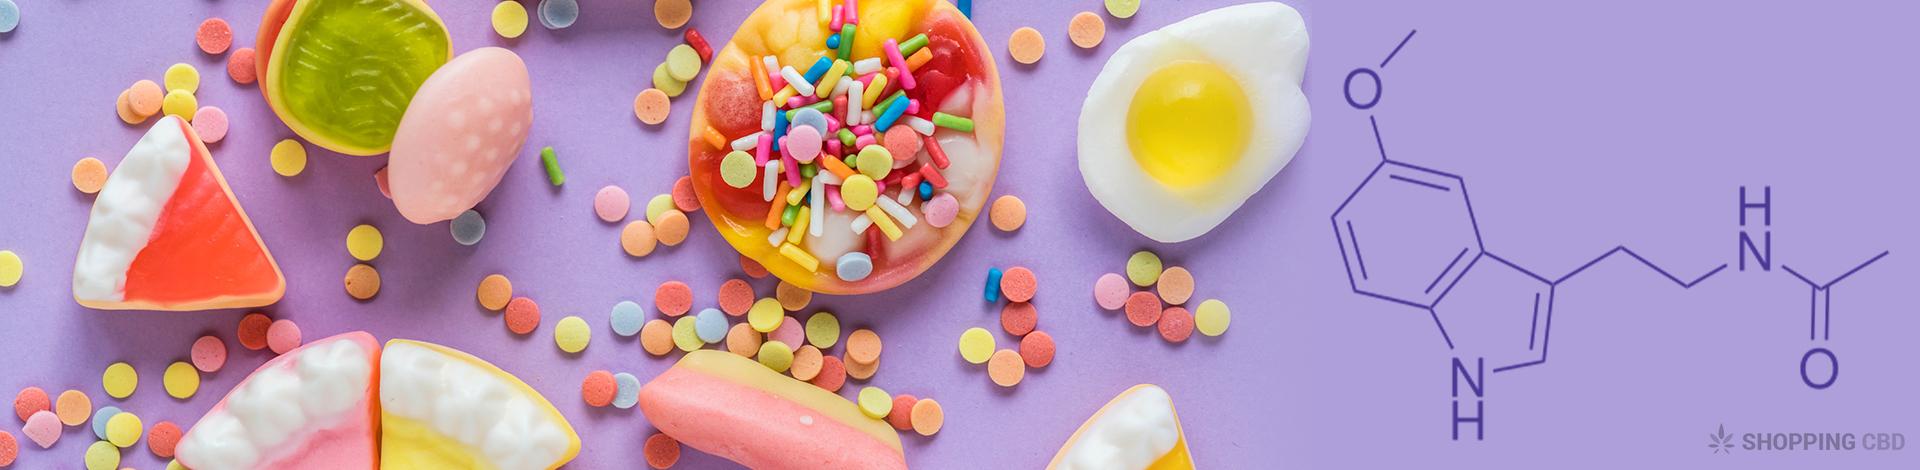 Melatonin Gummies: Things You Need to Know